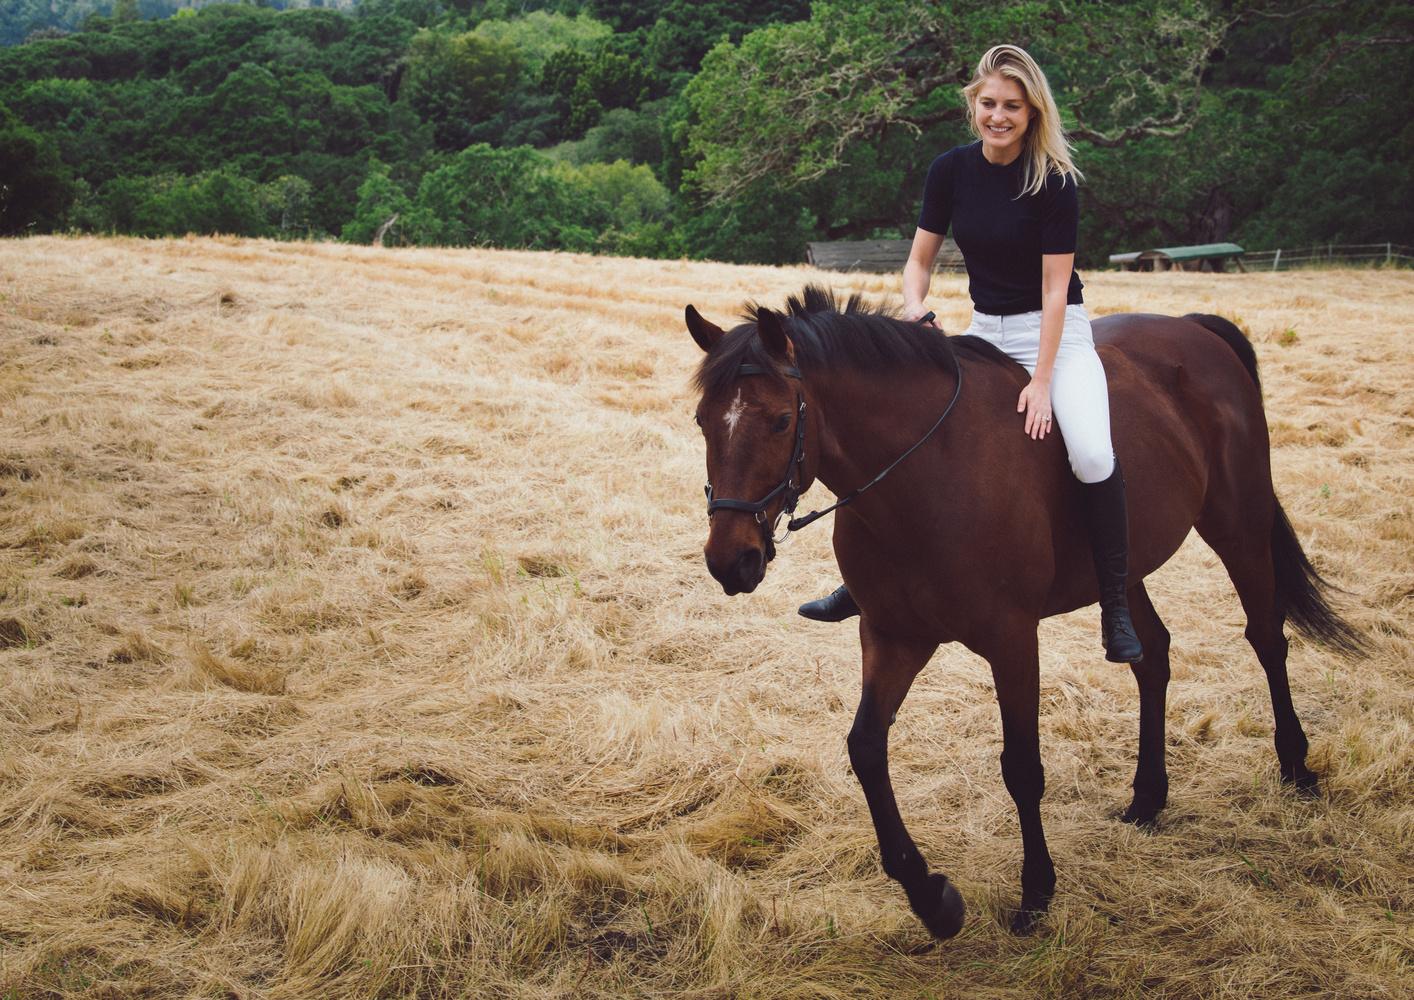 Equestrian by Oksana Kemp